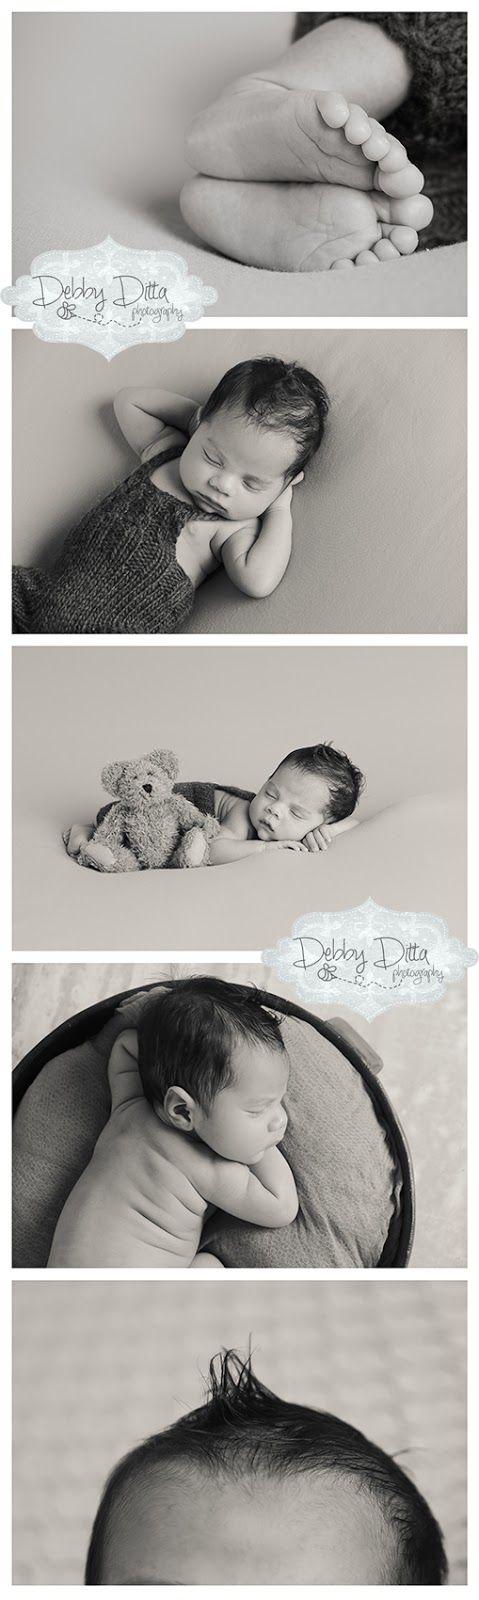 Beautiful Baby Boy Portraits Ideas On Pinterest Baby Boy - 25 brilliantly geeky newborn photoshoots